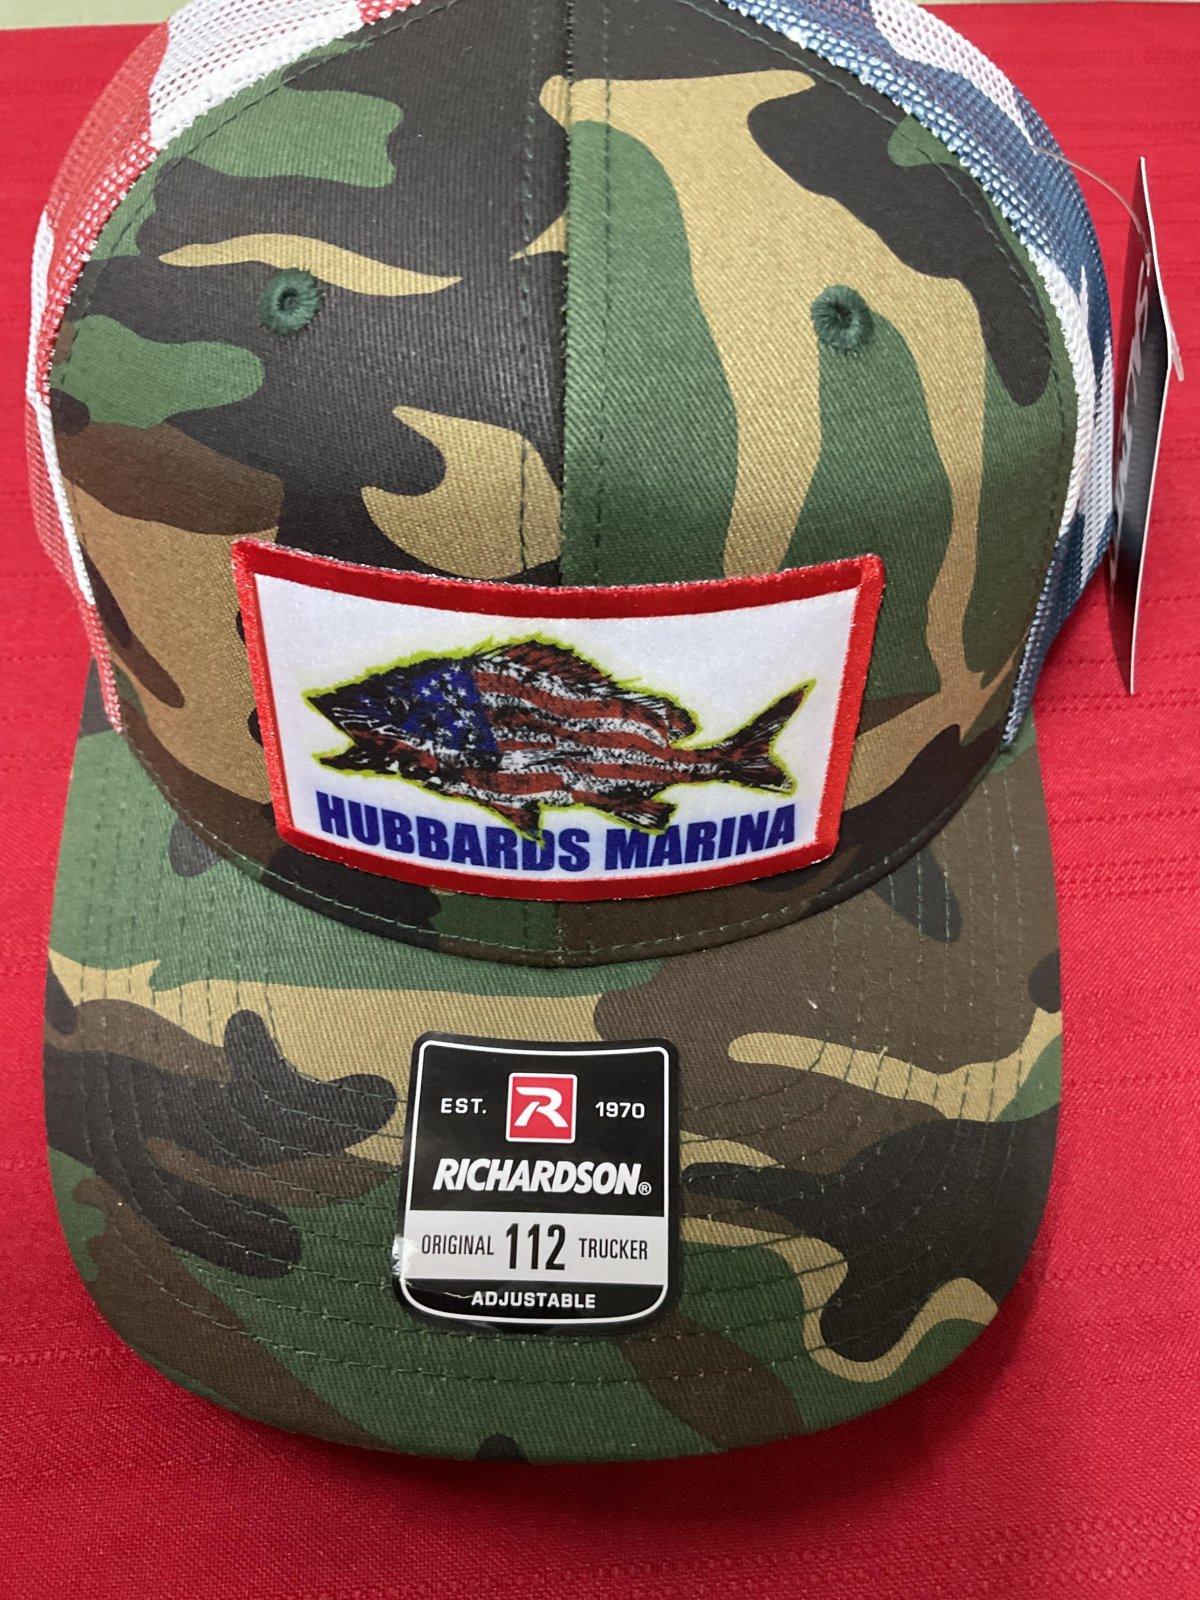 Hubbard's Marina American Grey Snapper patch - Green Camo/American Flag